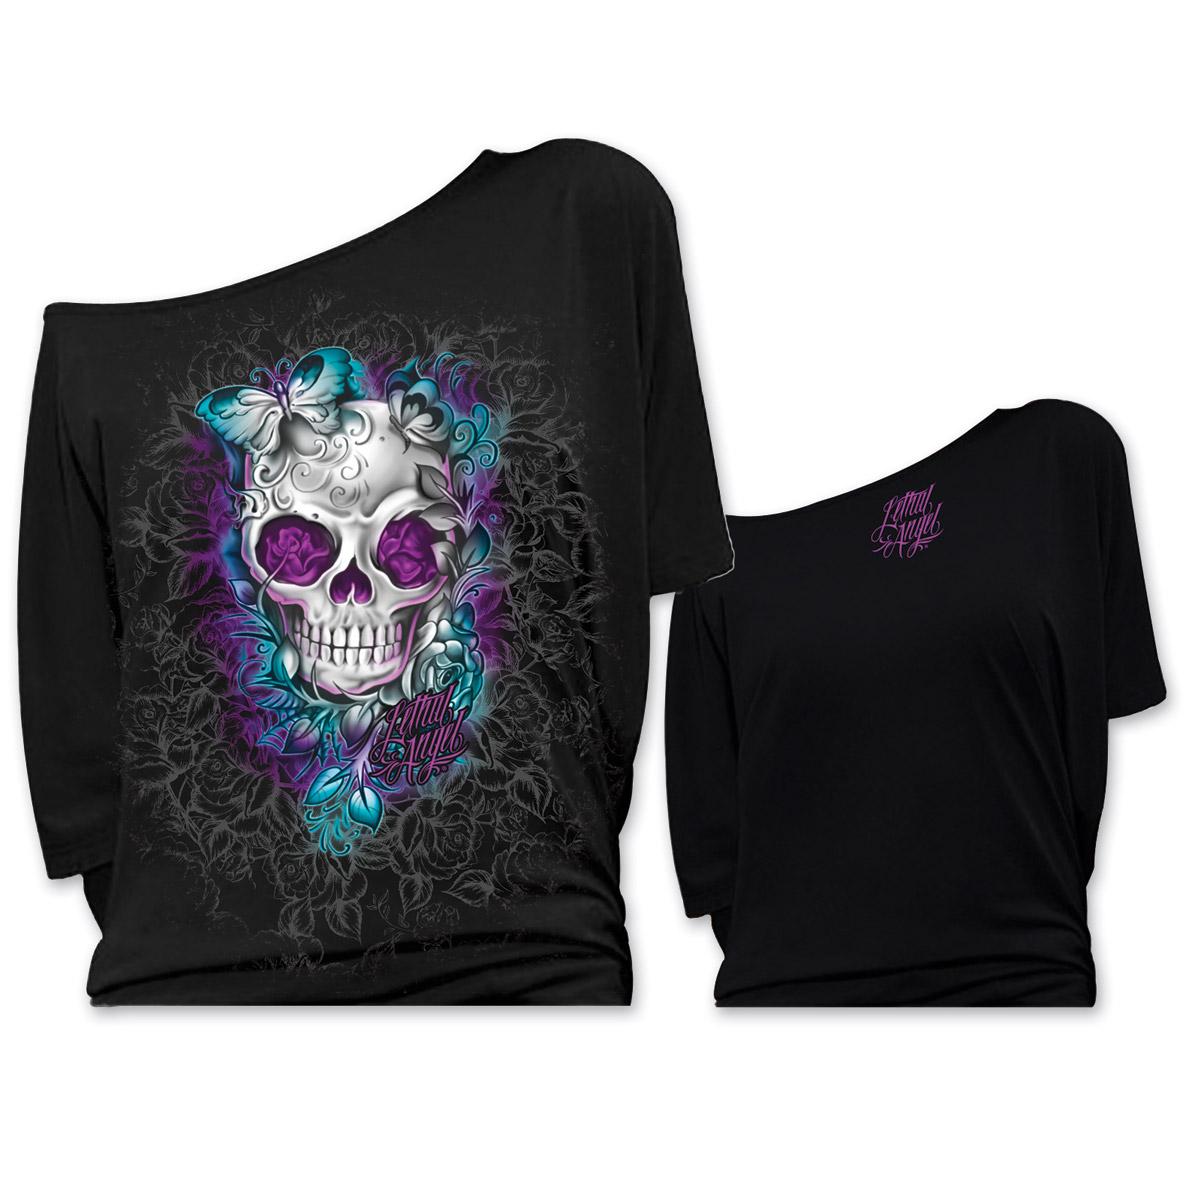 Lethal Angel Women's Butterfly Skull Off The Shoulder Black T-Shirt